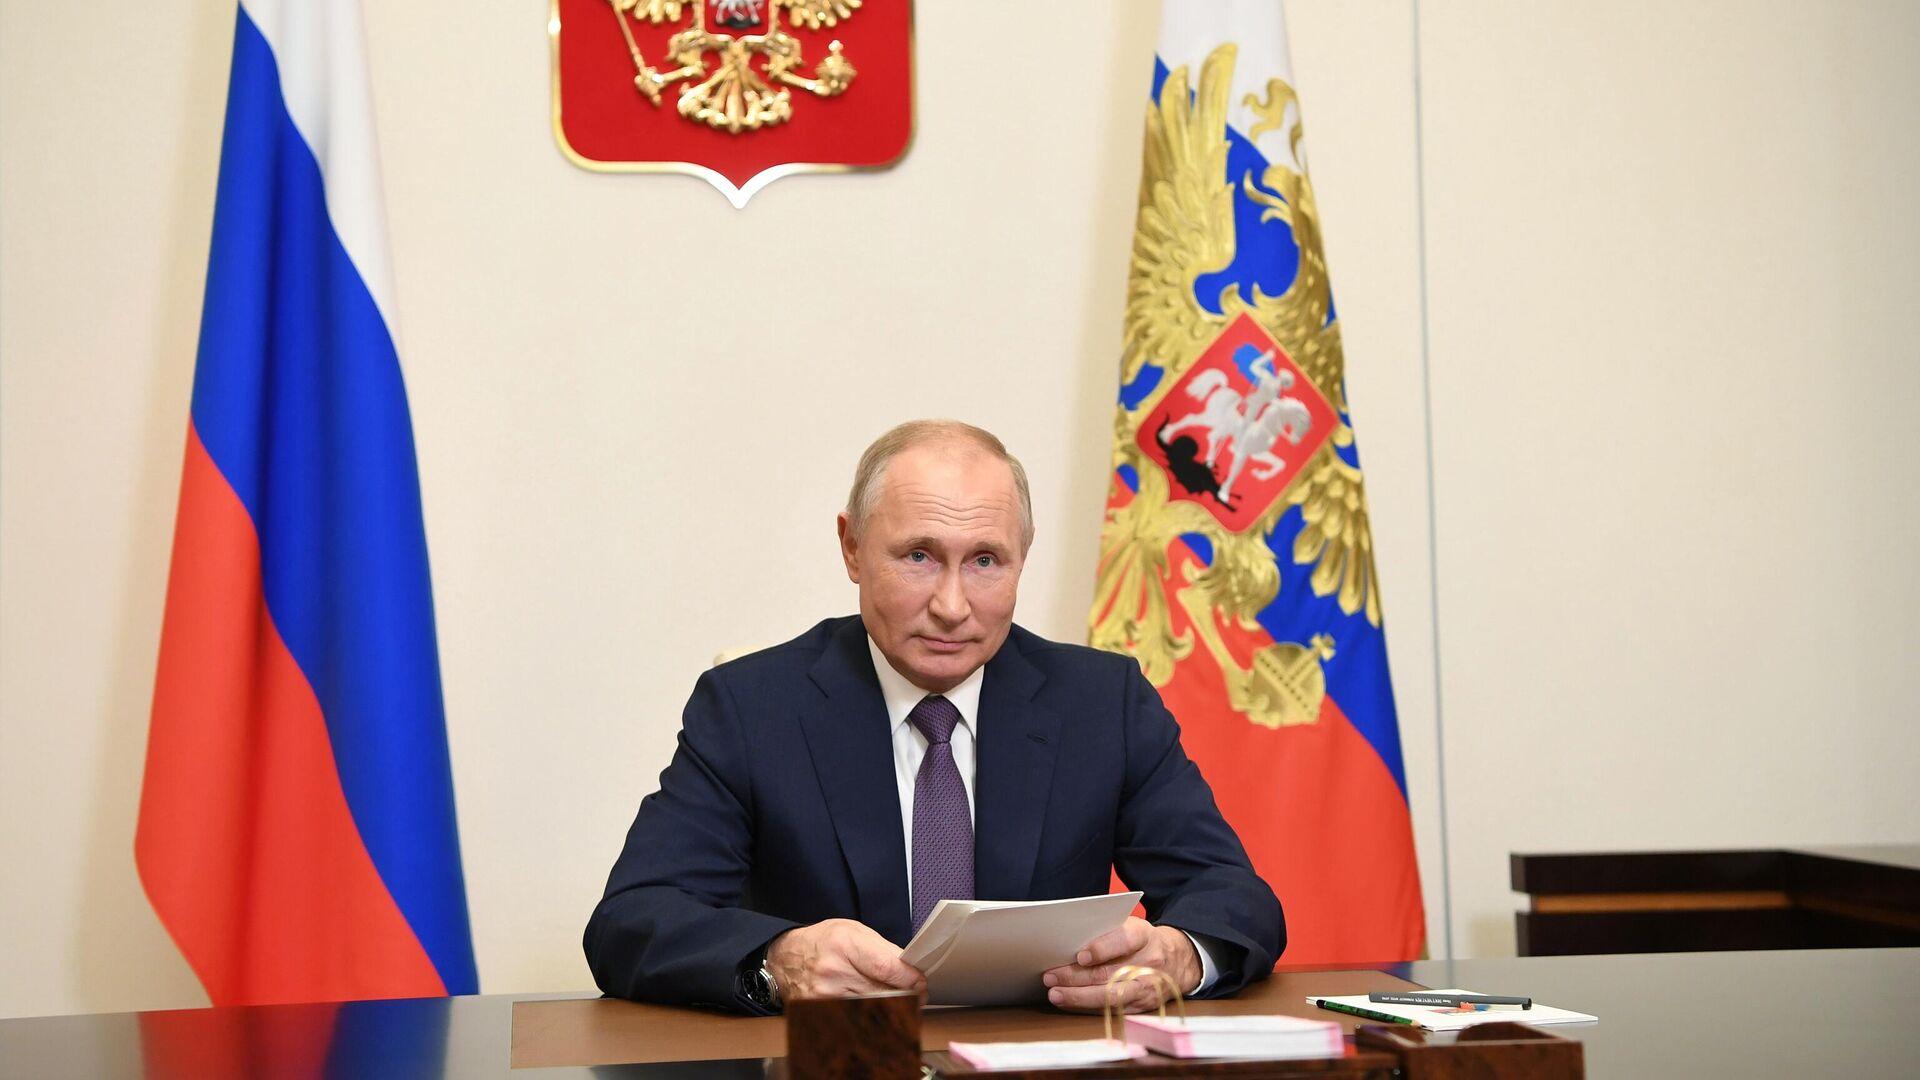 Президент РФ Владимир Путин - РИА Новости, 1920, 23.11.2020